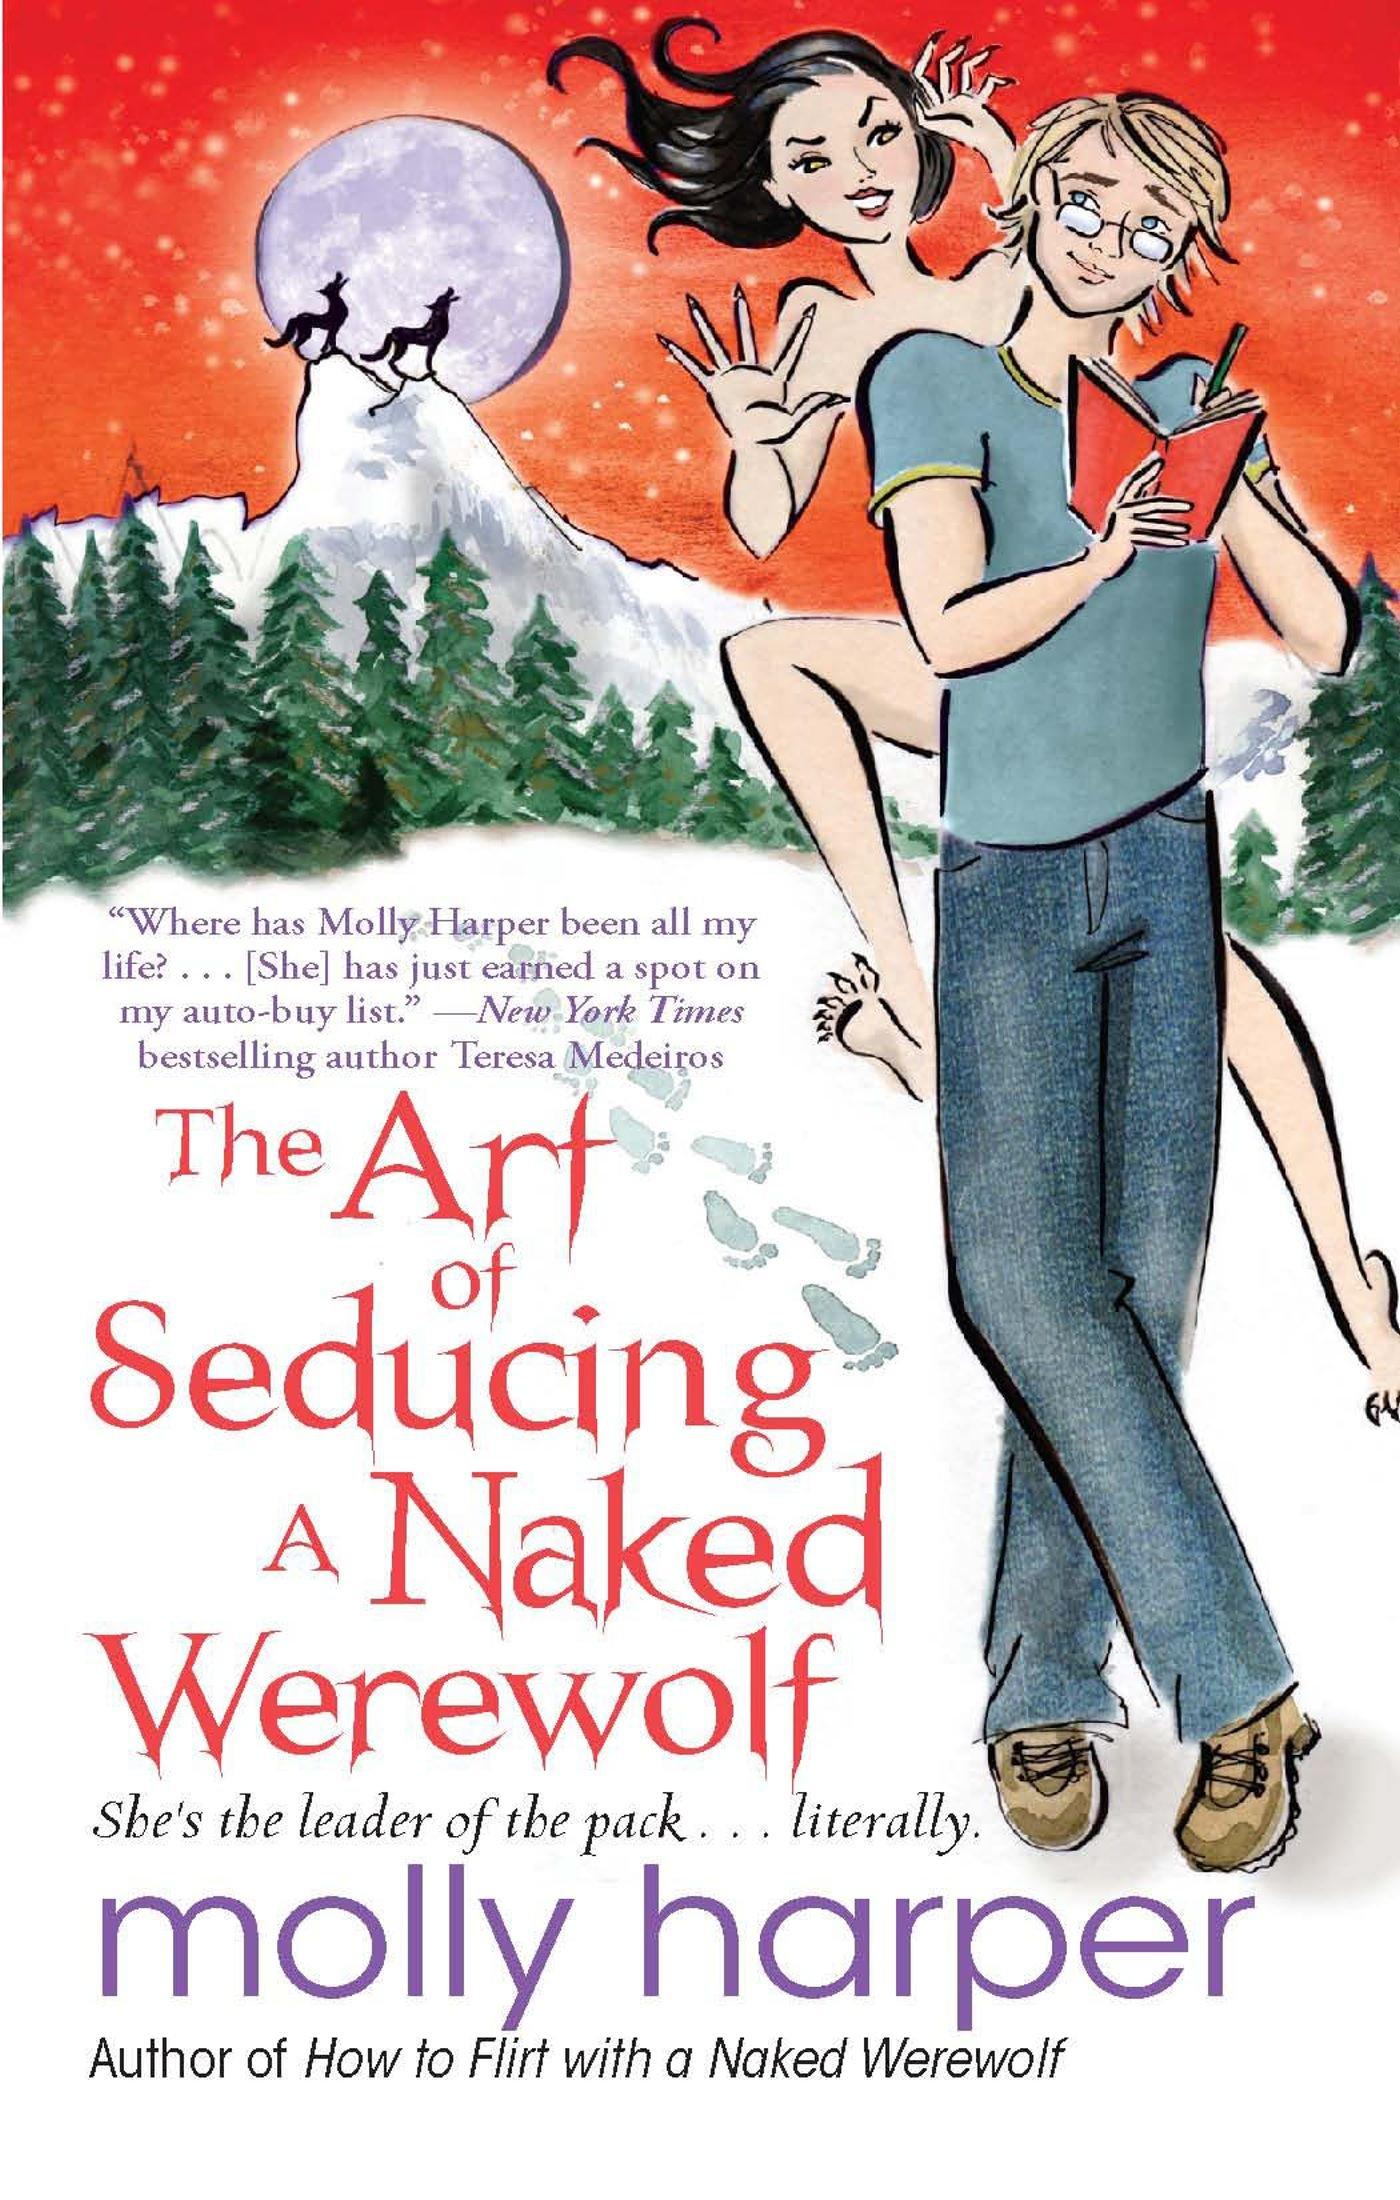 4e185c21152 The Art of Seducing a Naked Werewolf  Molly Harper  9781476752860 ...